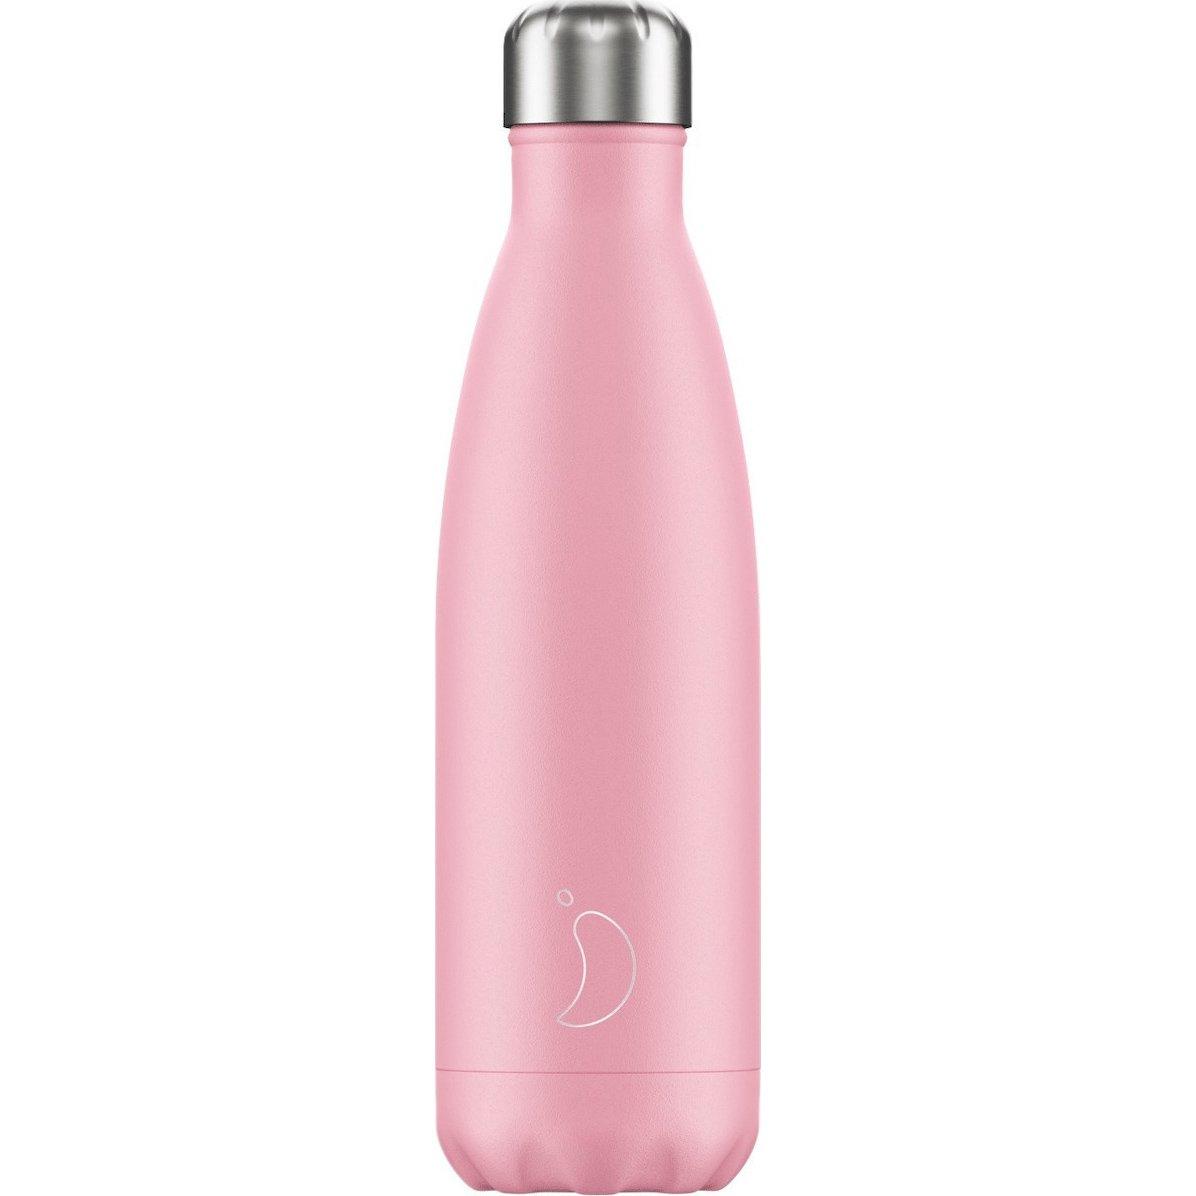 Chilly's Bottle Ανοξείδωτο Θερμός 500ml – Ροζ Παστέλ